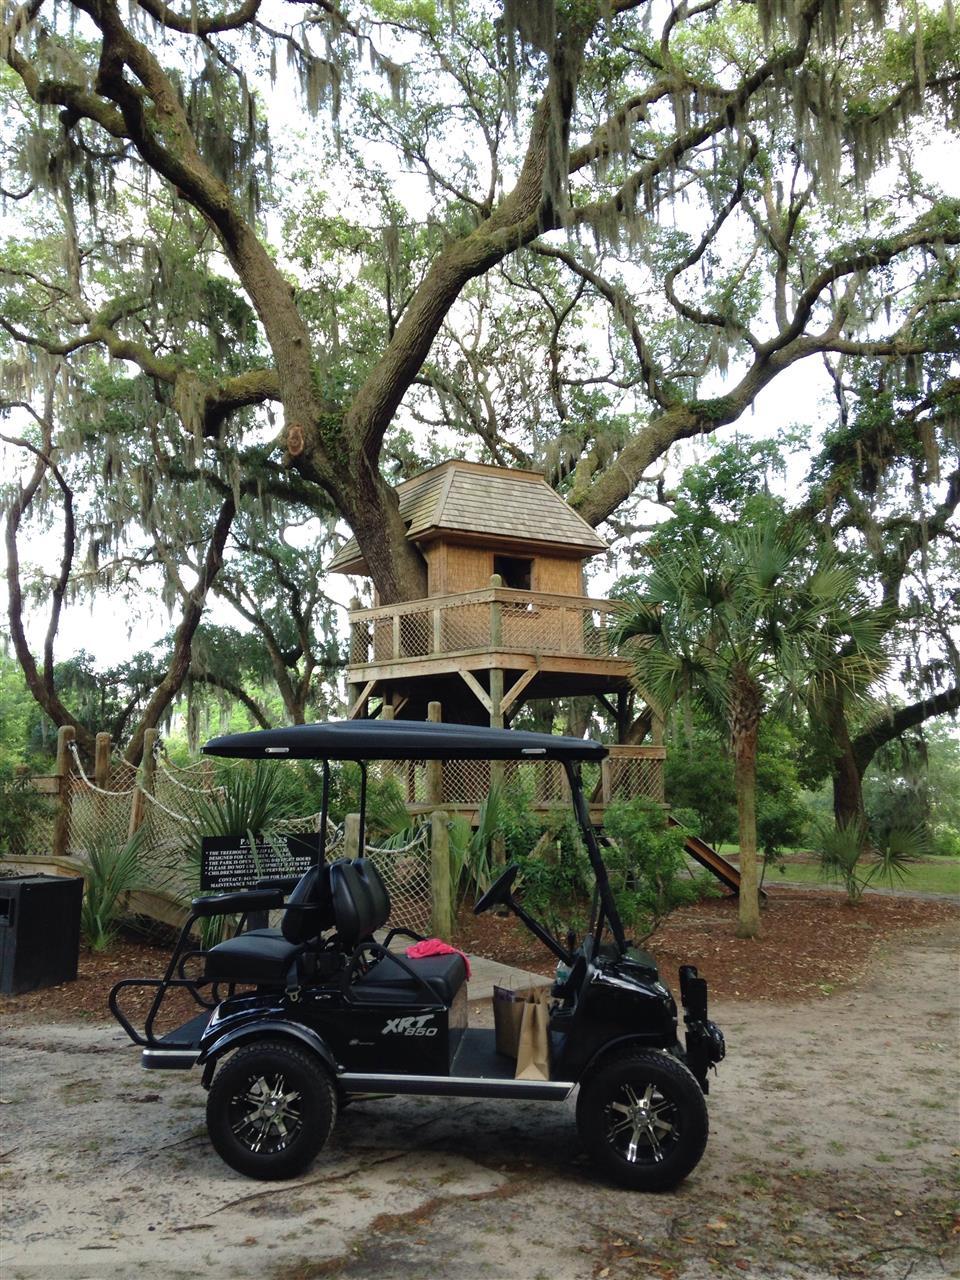 Palmetto Bluff Bluffton/HHI SC, taking a ride to the fun liveoak treehouse for the community of Palmetto Bluff